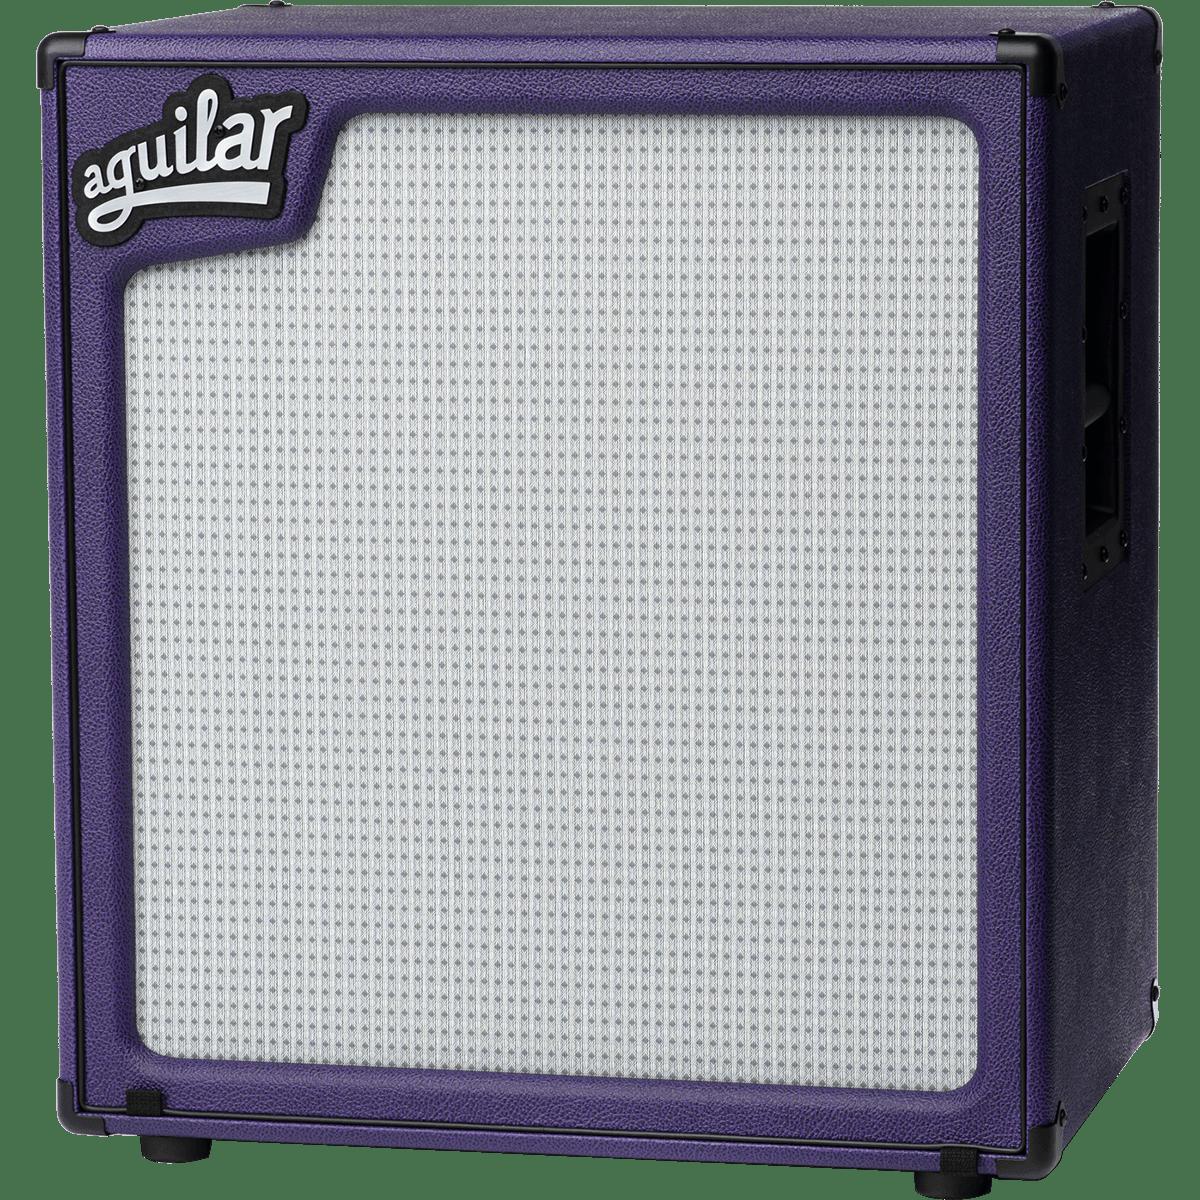 Aguilar SL410 Royal Purple 8 ohm